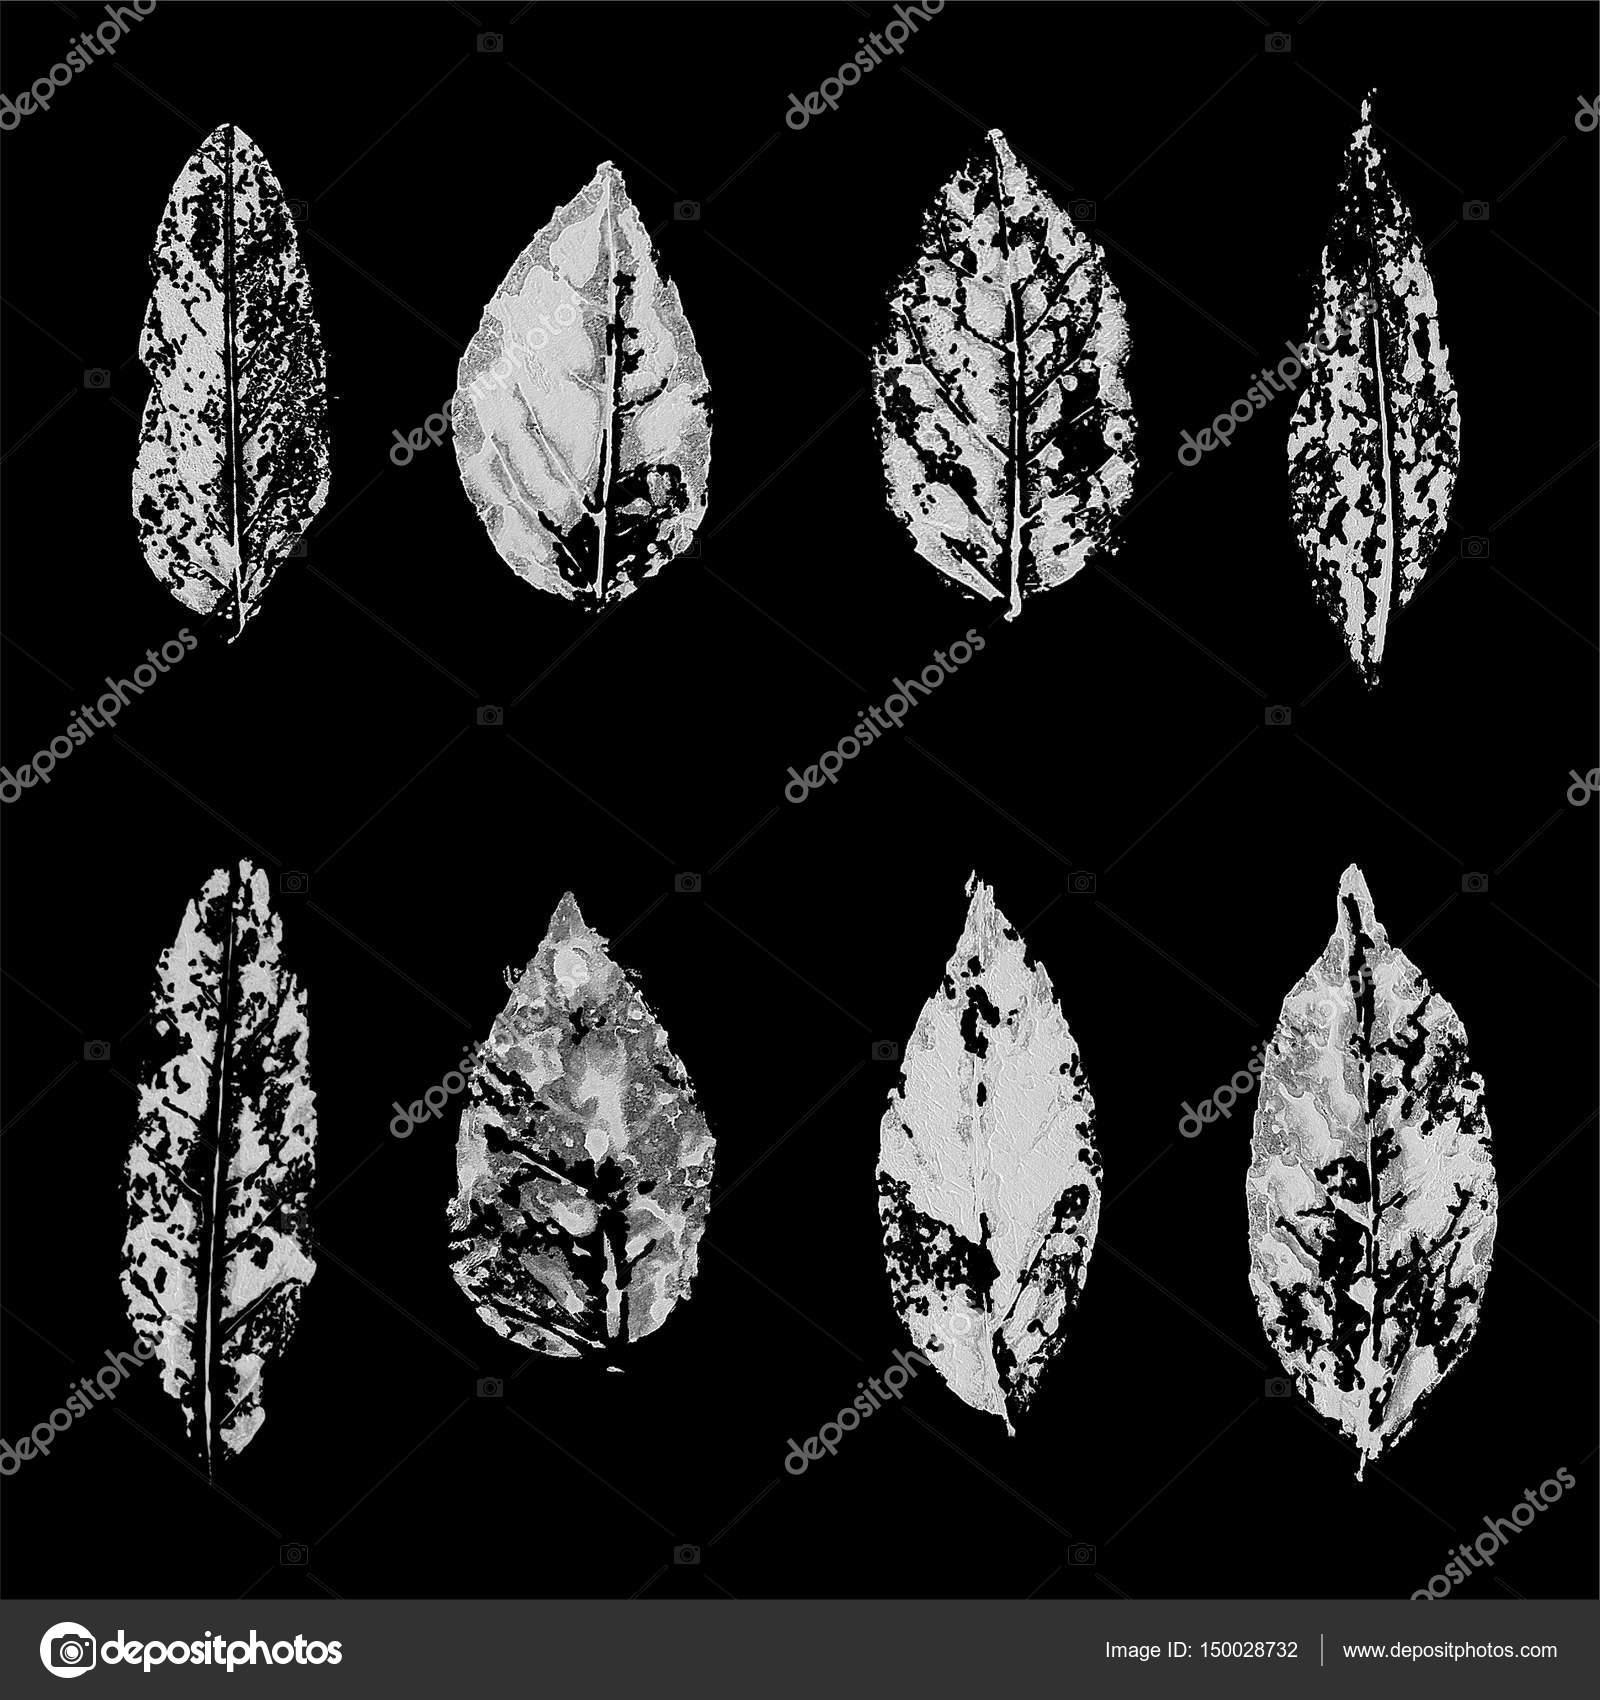 Ursprüngliche Natur print — Stockfoto © midonova.tamara #150028732